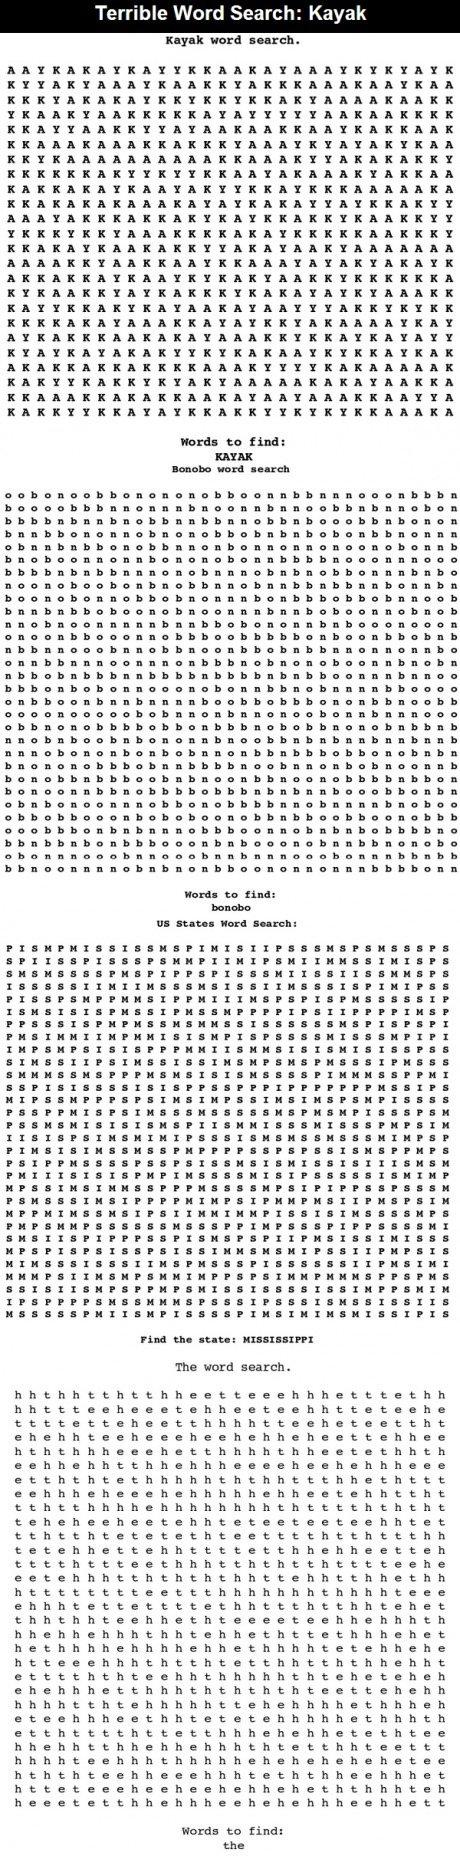 Hard Crossword. Find them all. I t m VIII: I am fl h In III III I I I I troath, to finch than. Contain you're orgasms.